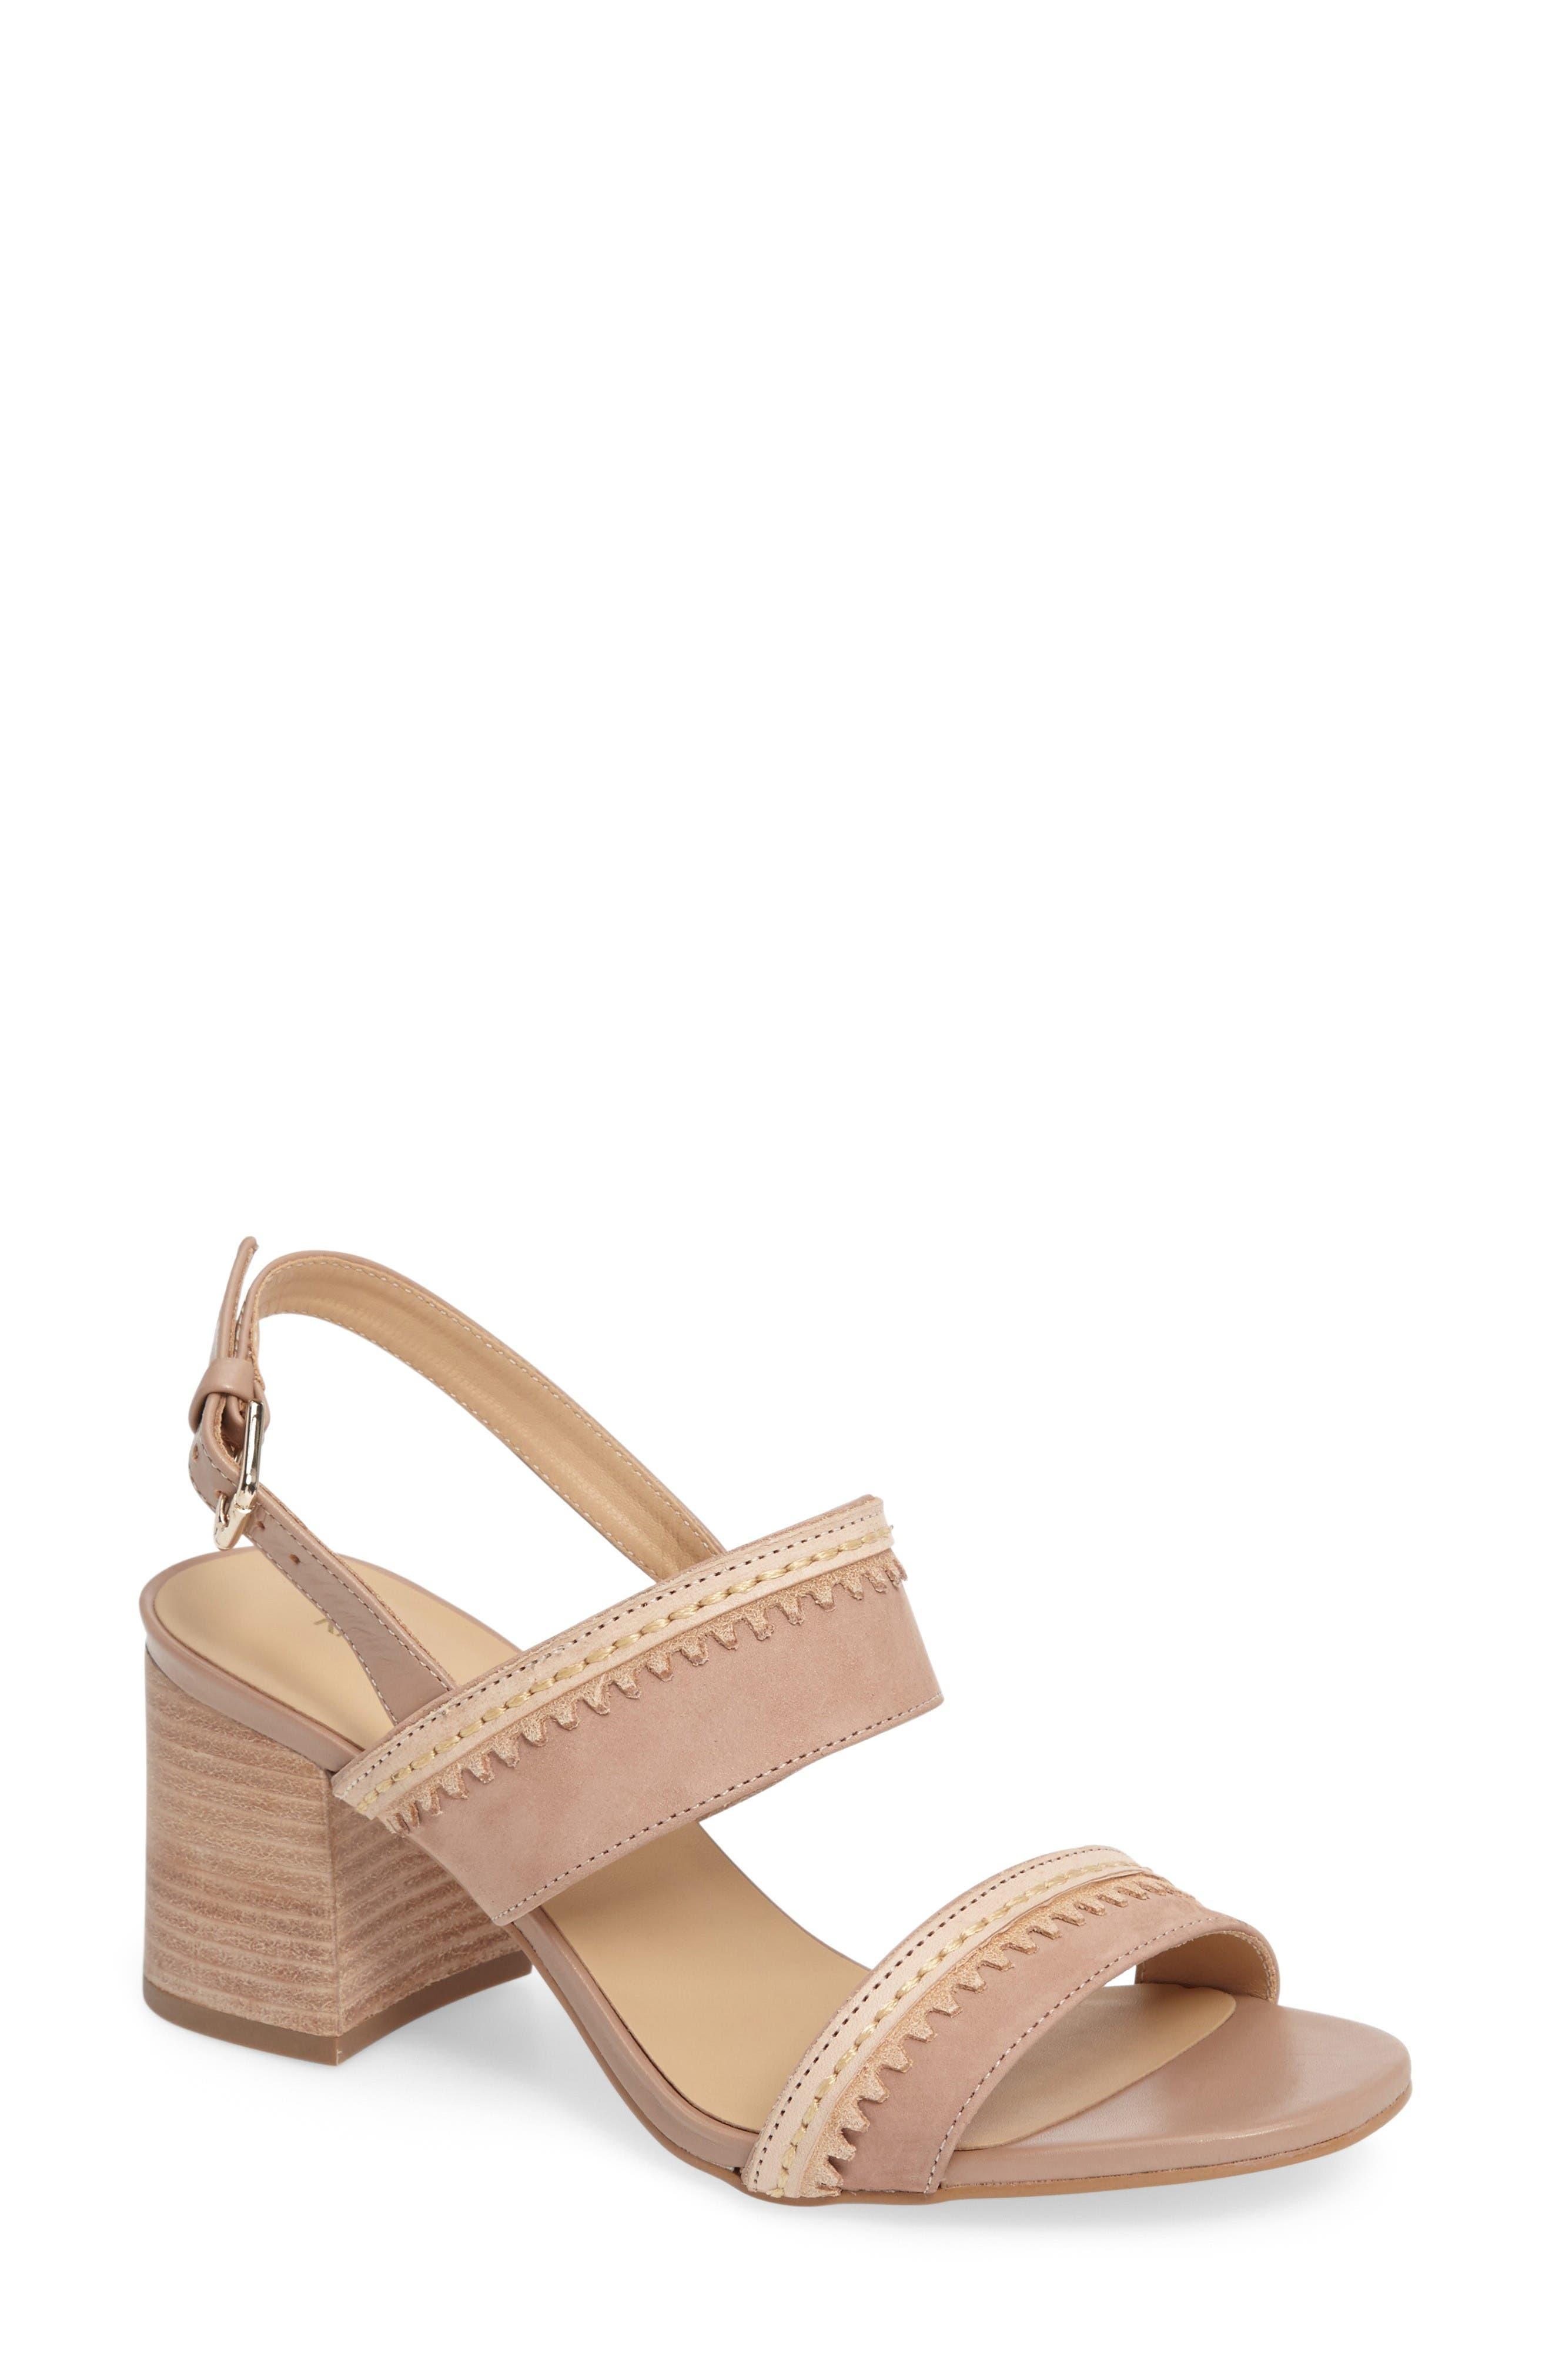 Rycca Block Heel Sandal,                             Main thumbnail 1, color,                             Blush Leather